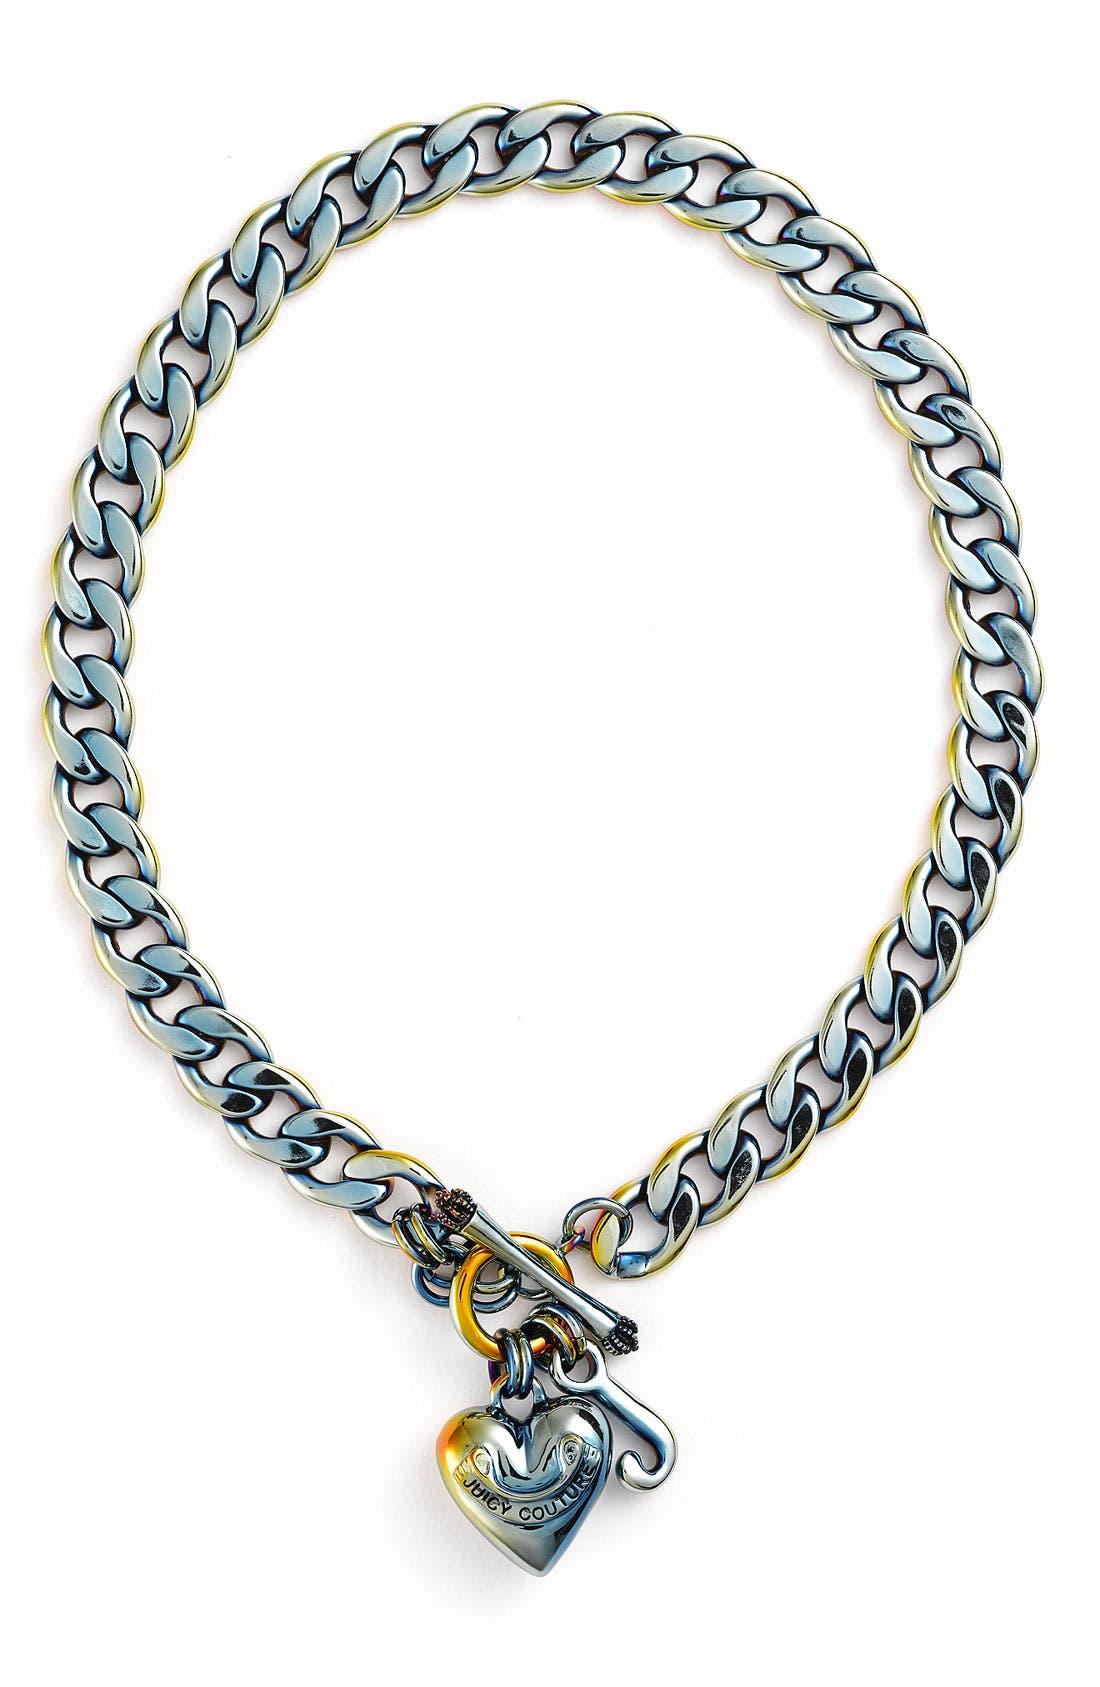 Main Image - Juicy Couture Pavé Starter Charm Necklace